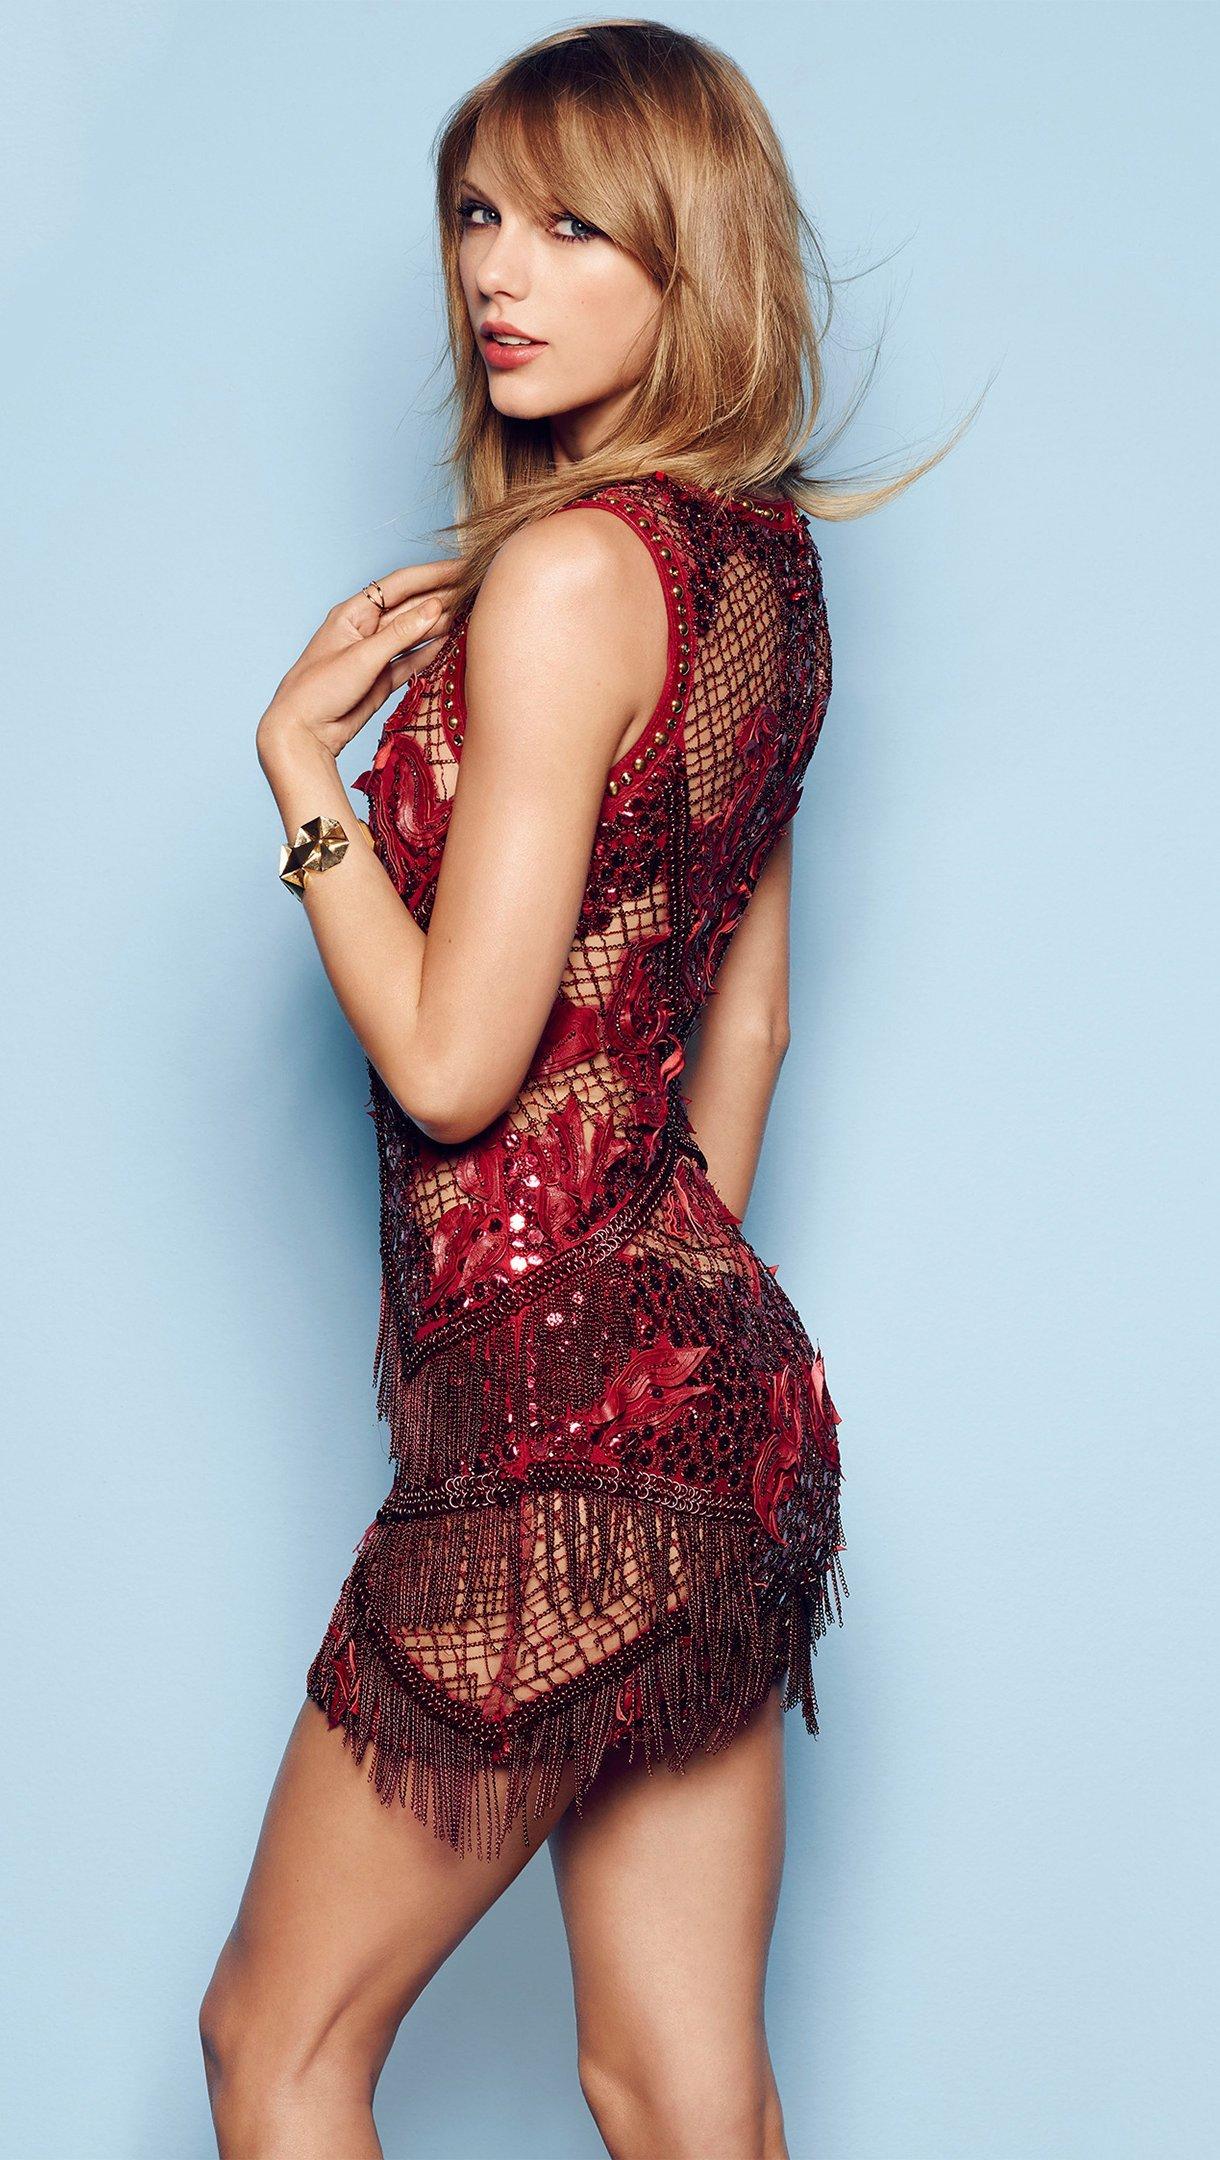 Wallpaper Taylor Swift for Cosmopolitan Vertical